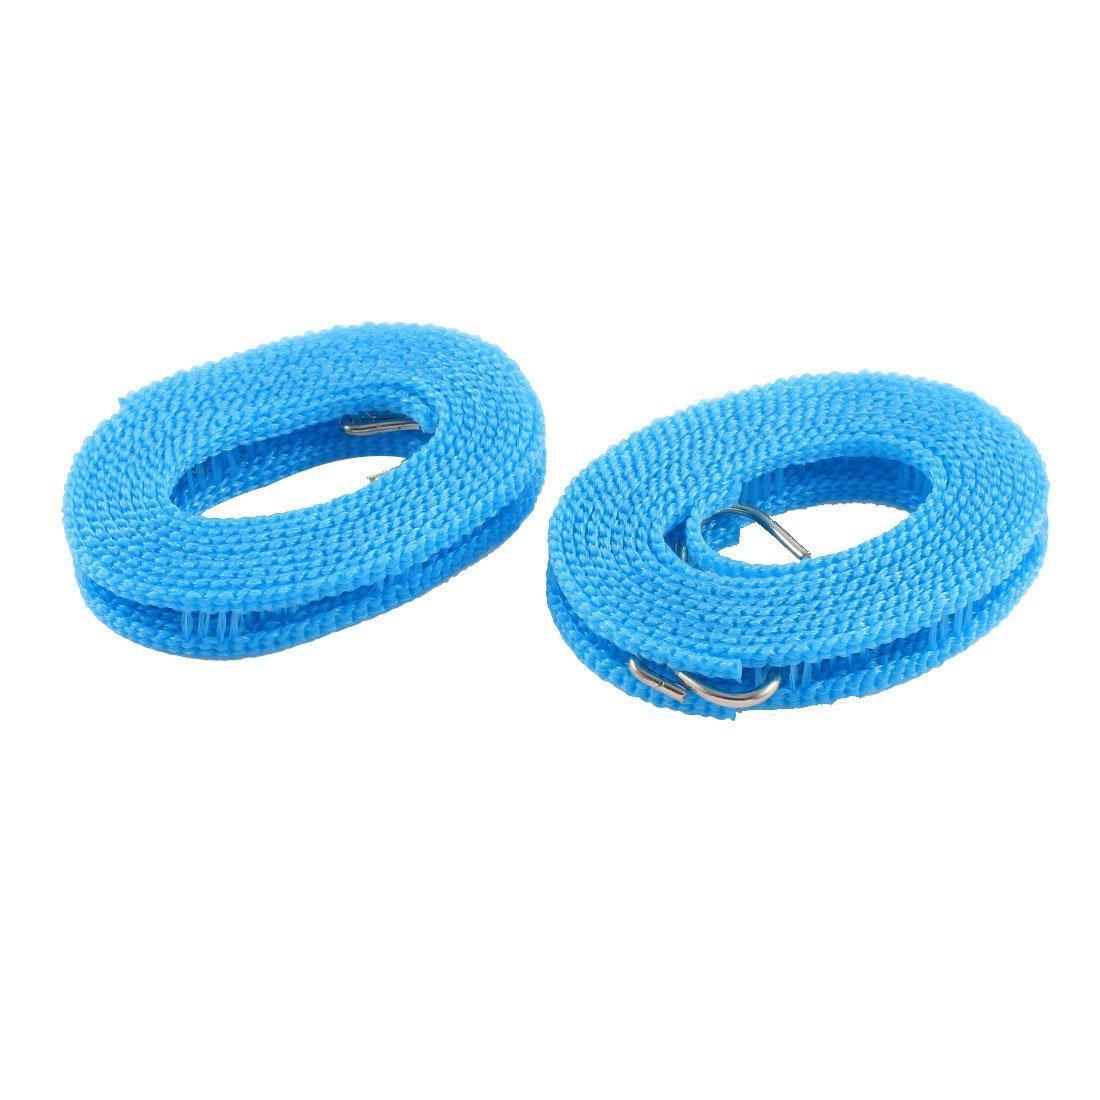 uxcell® Nylon Nonslip Windproof Dual Hooks Braided Clothesline 2M 2 Pcs Blue